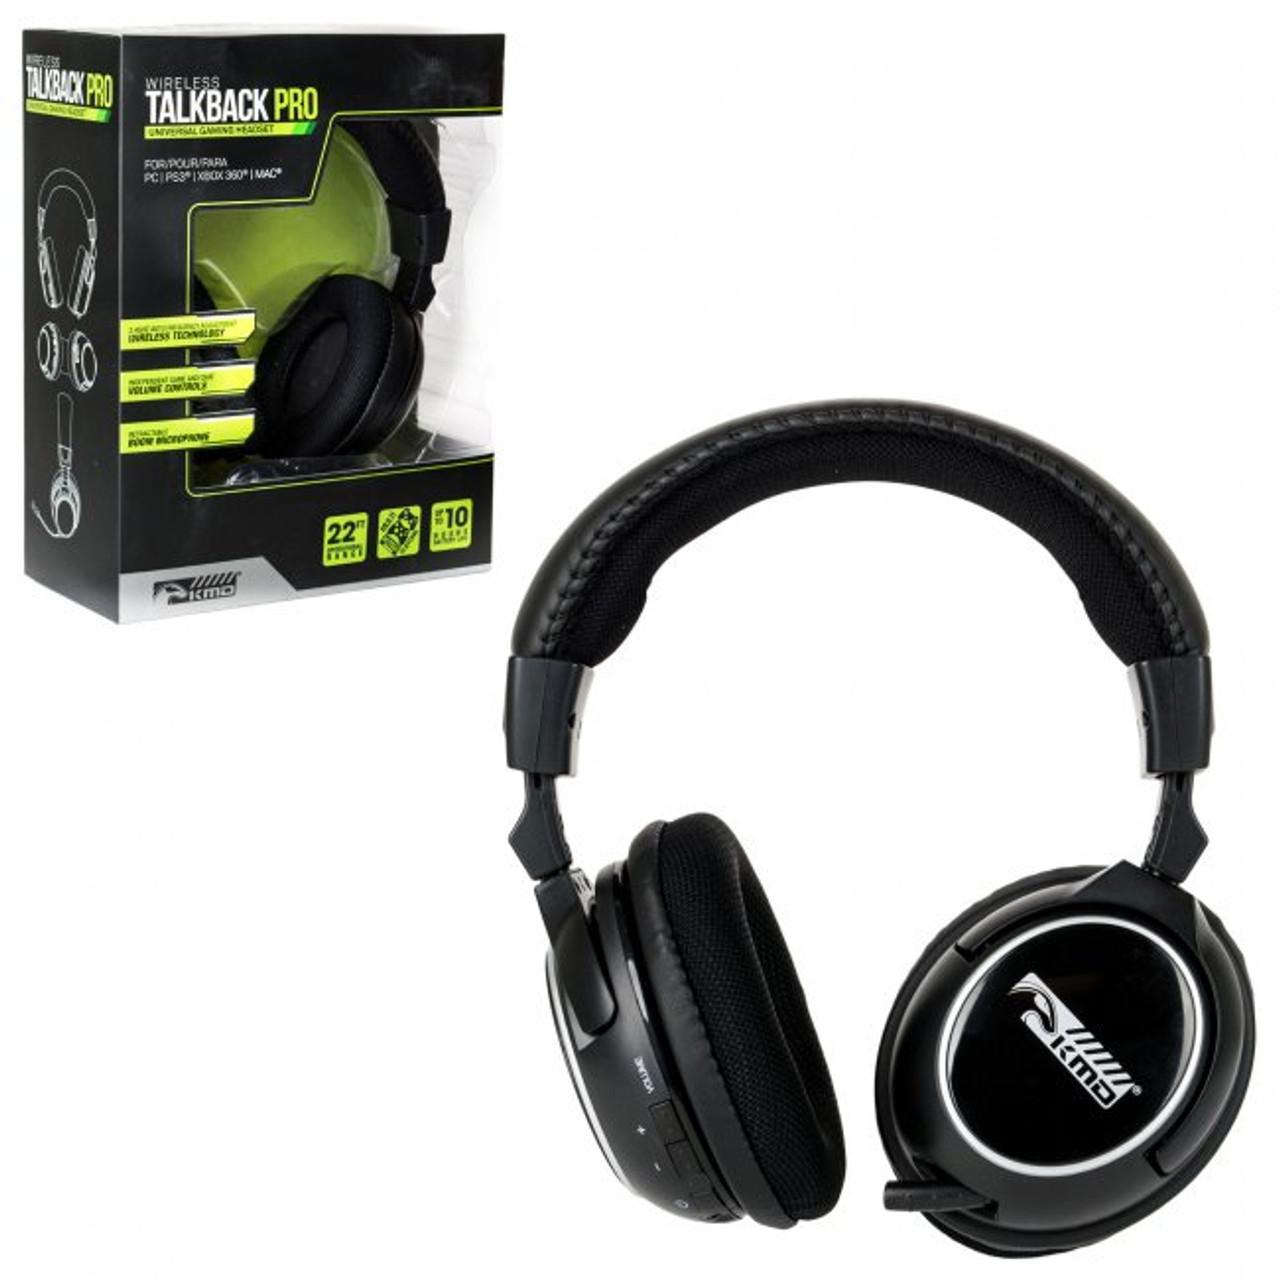 6165c3a13d3 Universal Wireless Talkback PRO Headset - Stone Age Gamer